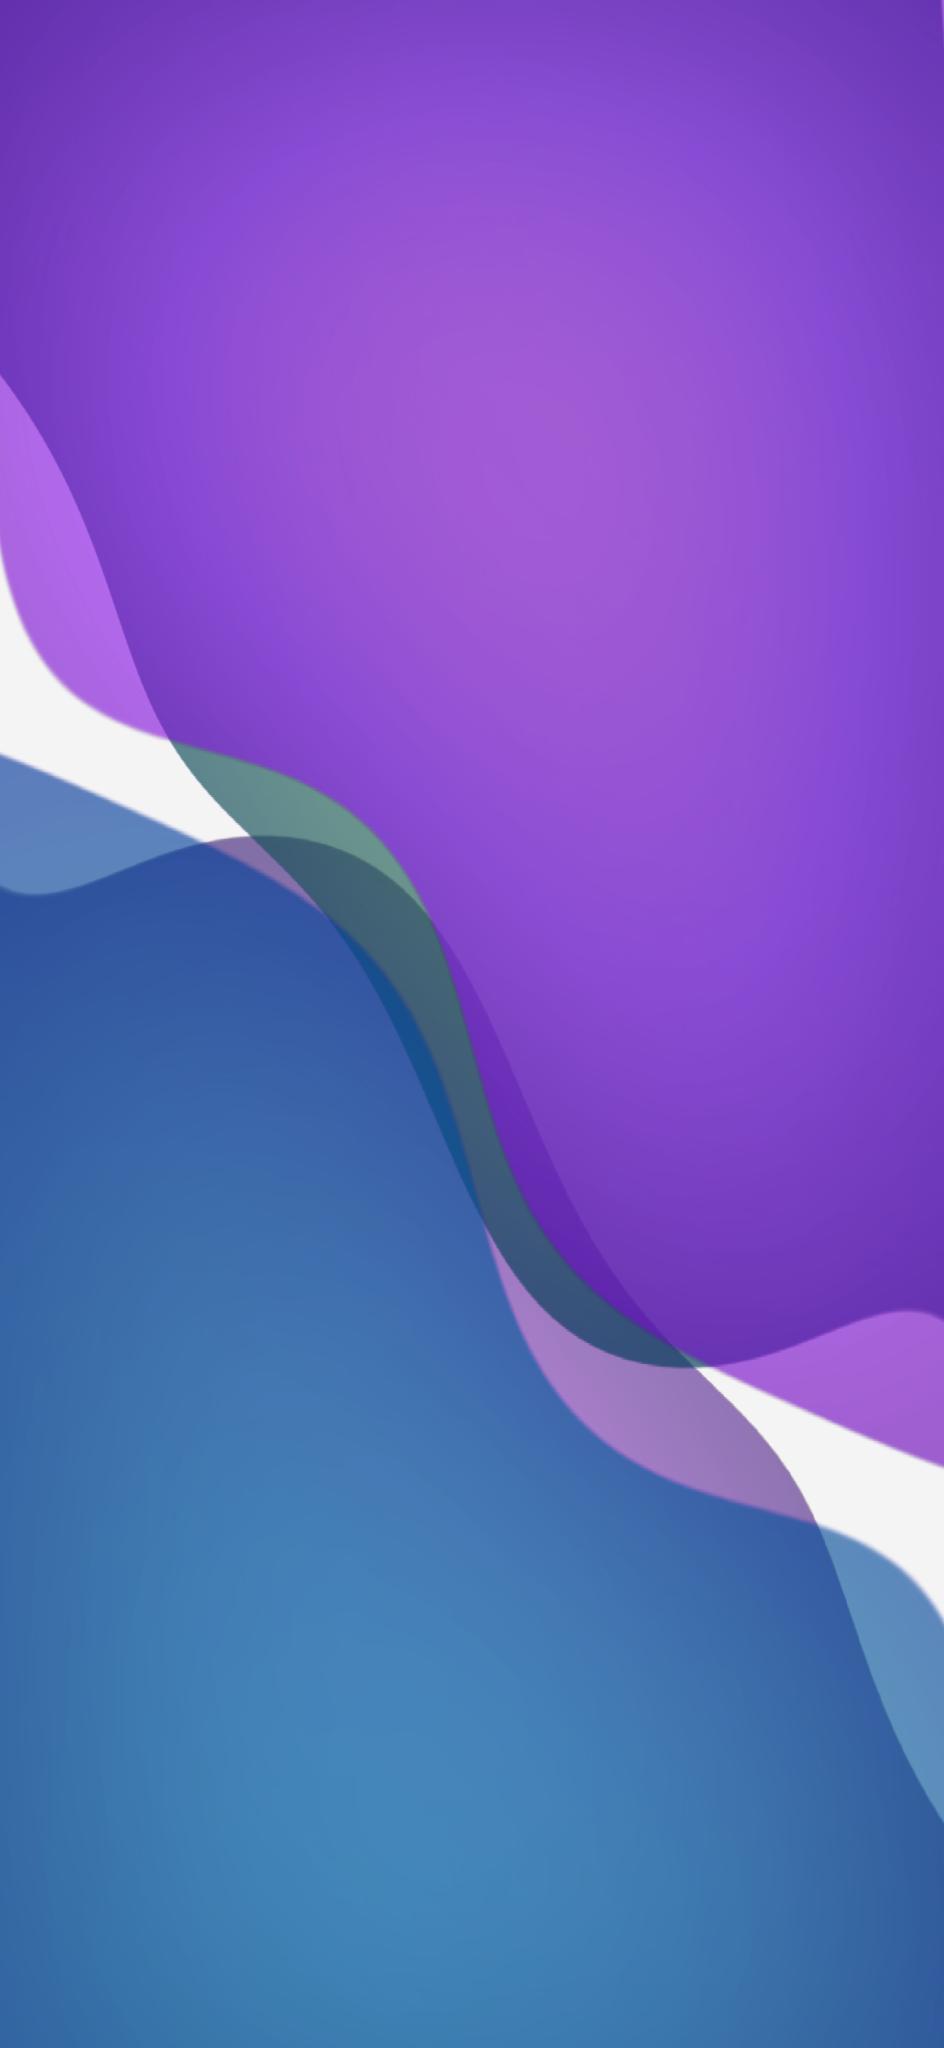 Pin By Soemadi Rito On Bahan Edit In 2020 Beautiful Wallpapers